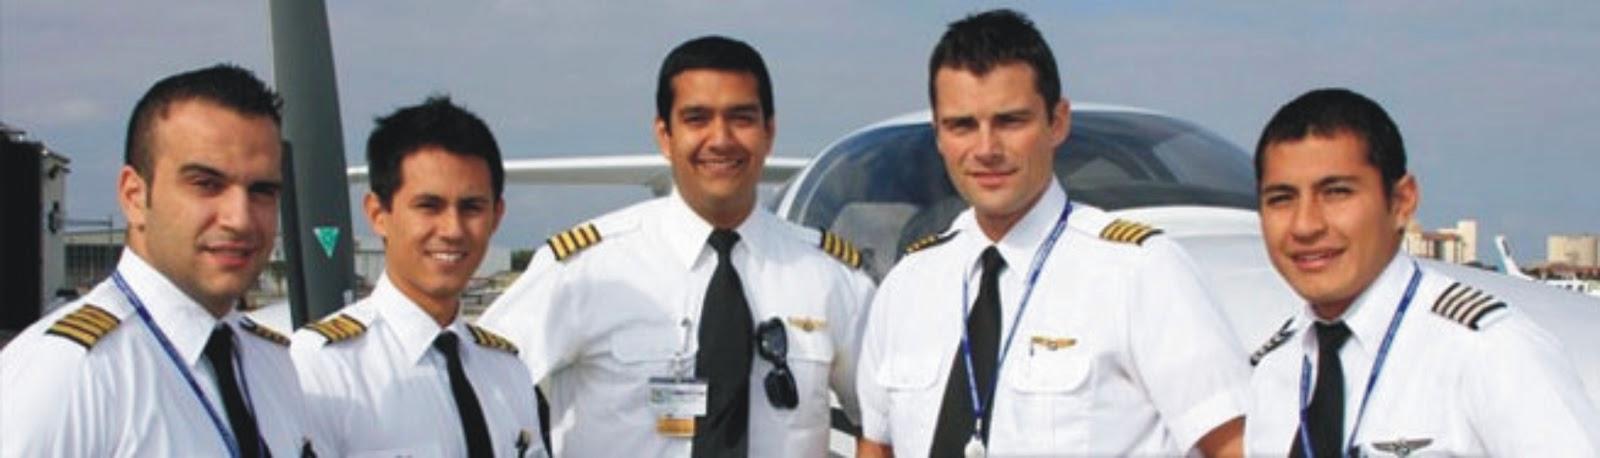 Aviation Seminar & Training For Schools And Organisations In Nigeria